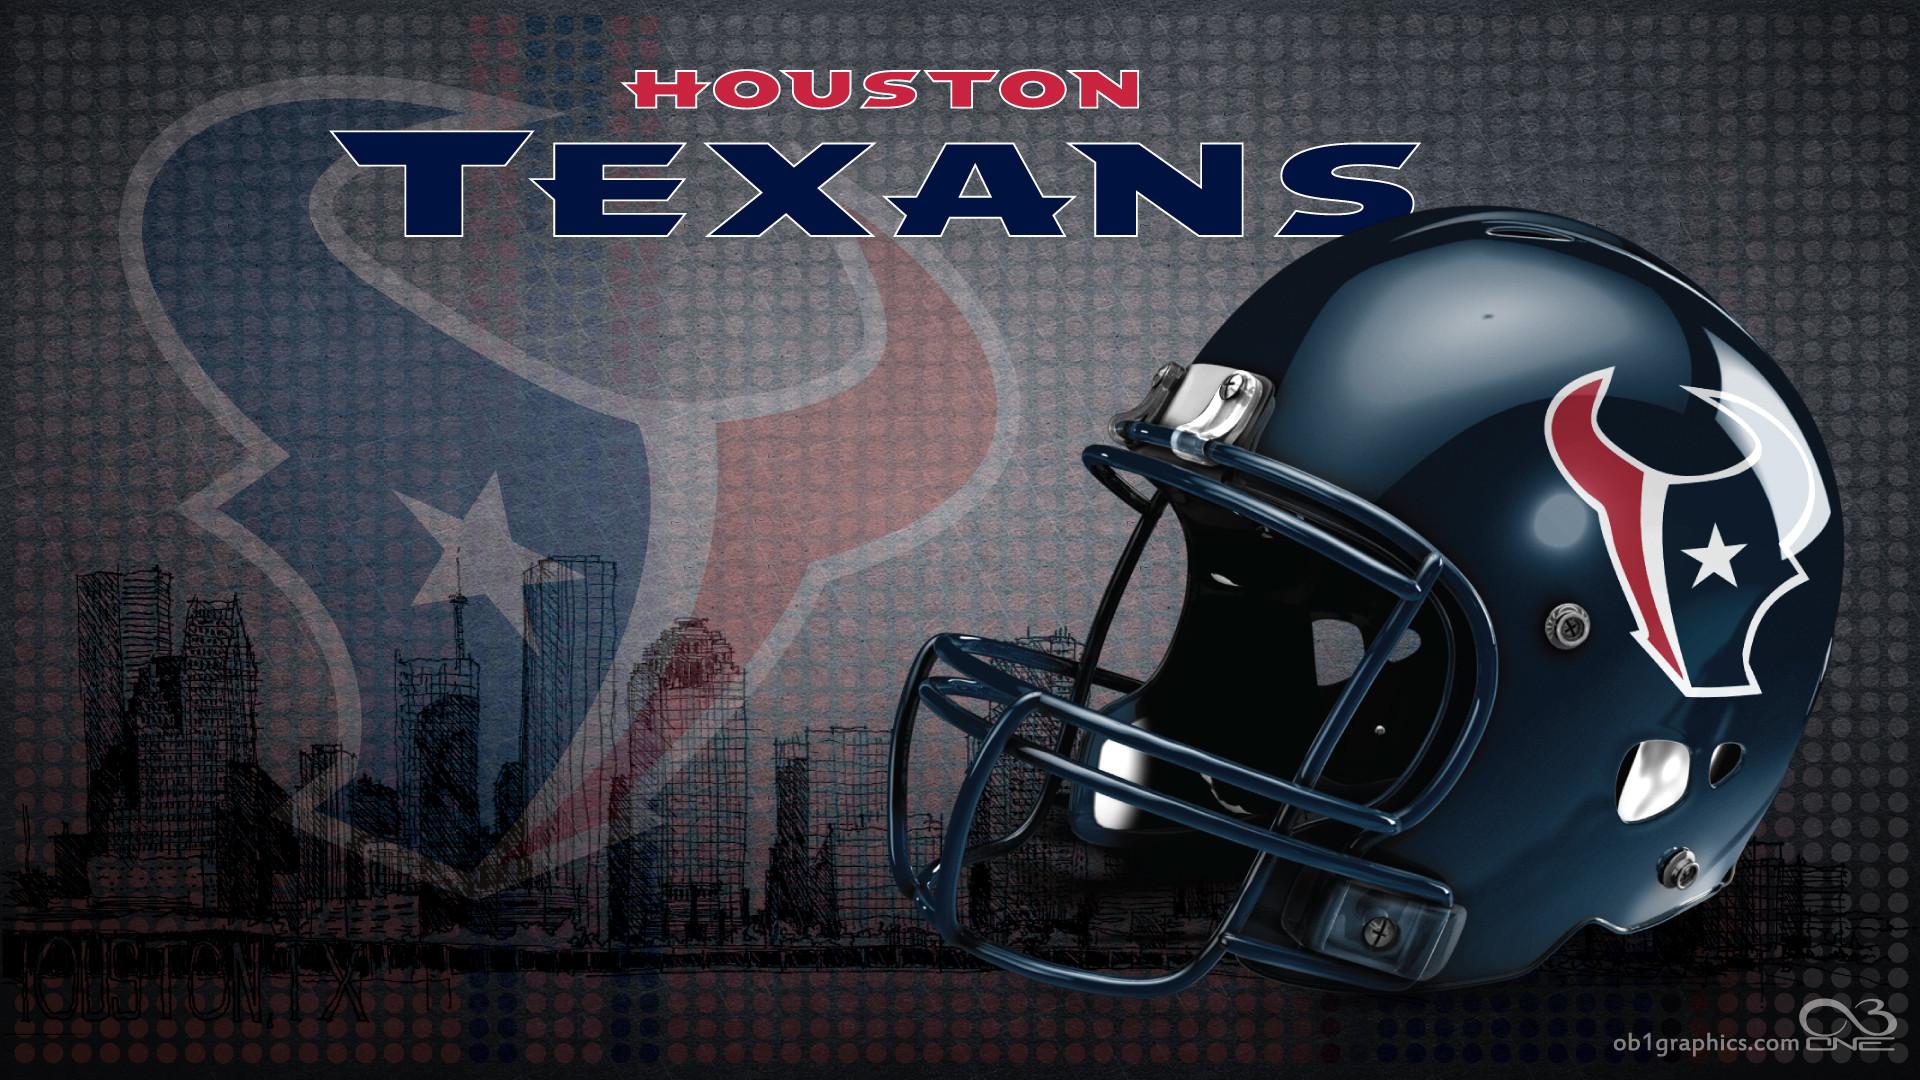 Texas Longhorns Screensavers for Pinterest 0 HTML code. Houston Texans (by  ~ texasOB1 ) | 1920 x 1080